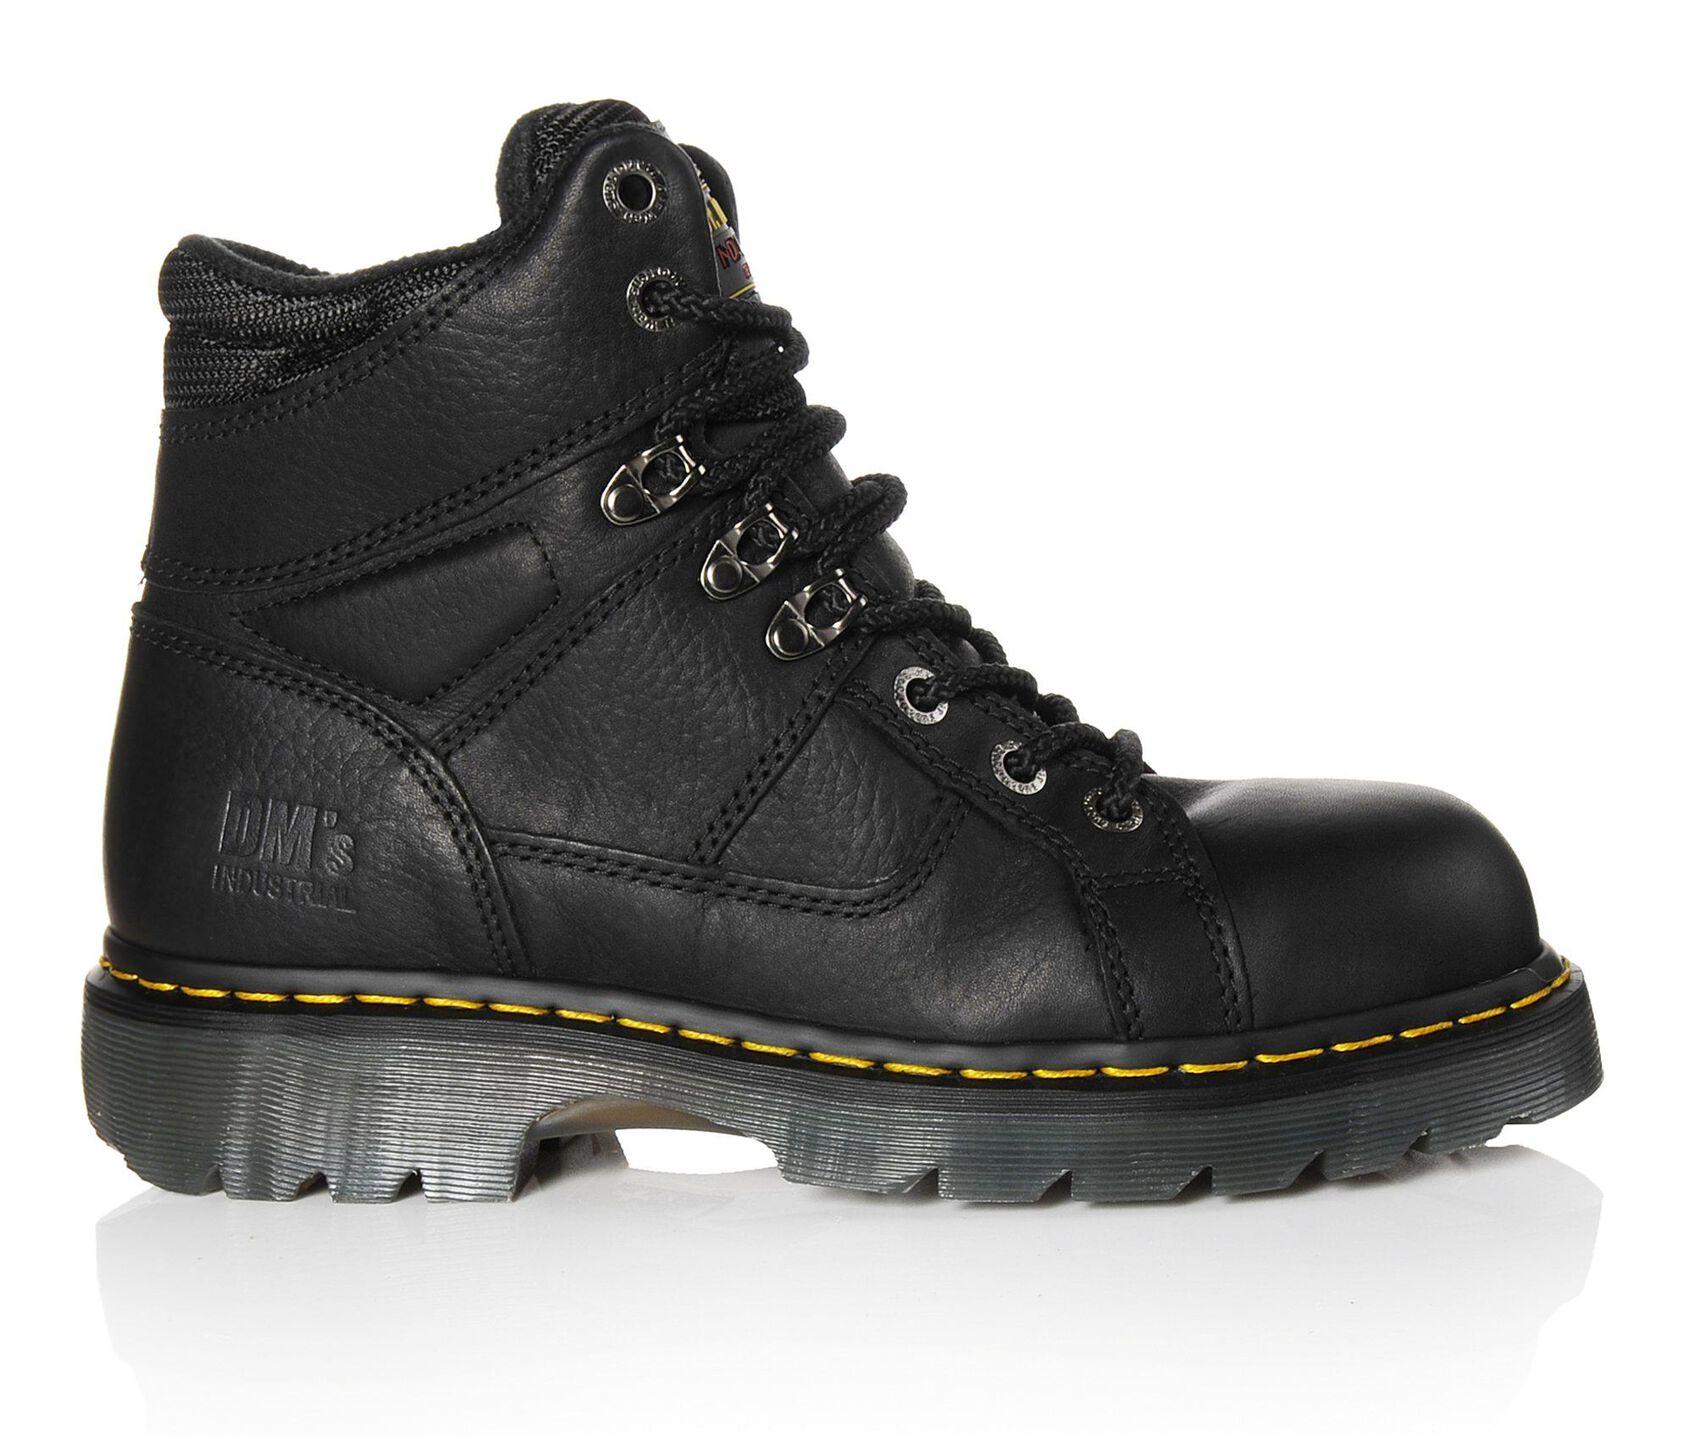 Fashionable steel toe work boots 100